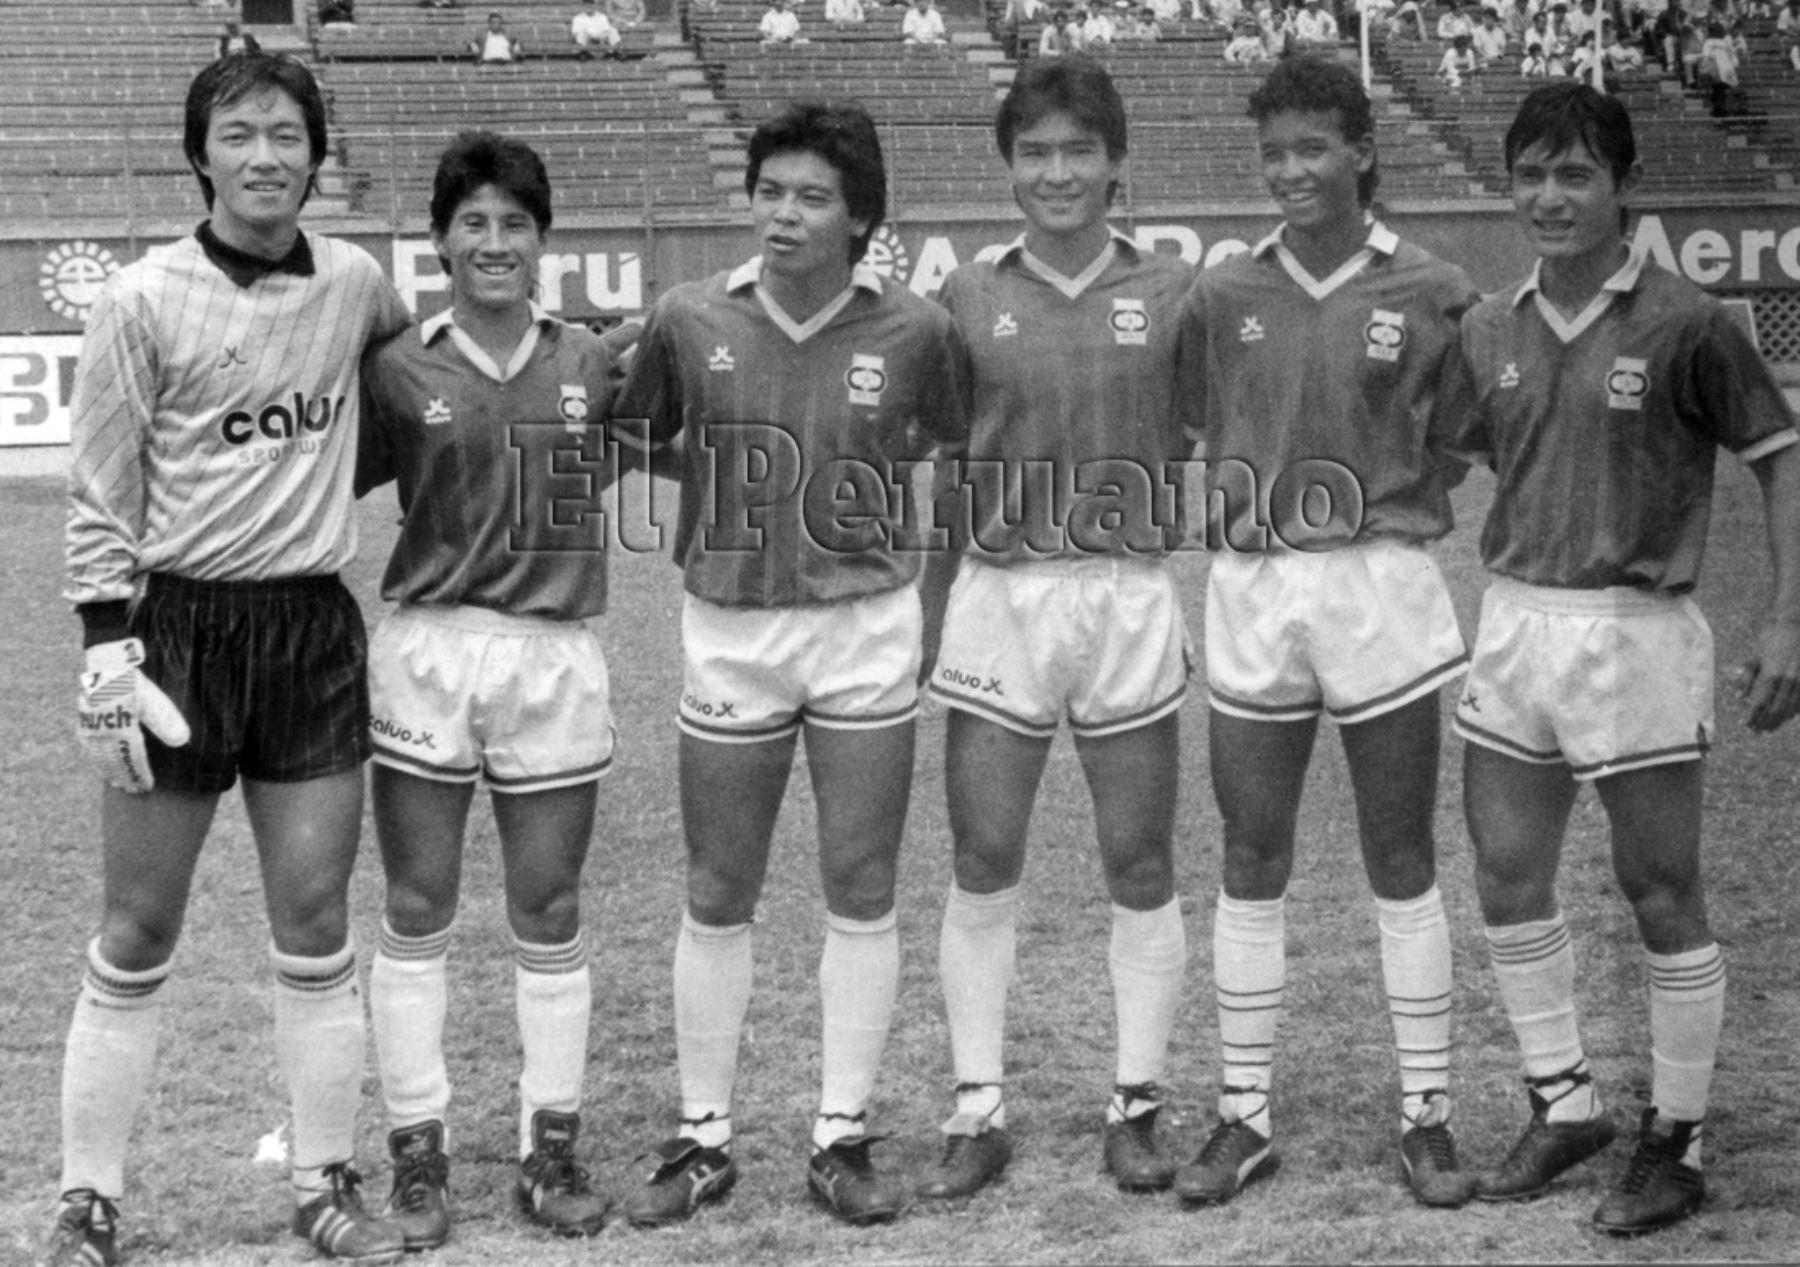 Lima - abril 1990 / Beto Akatsuka, Tito Takayama, Gabriel Kanashiro, Robert Yamamoto, Christian Kanashiro y Willy Uehara figuras del Club AELU de la primera división del fútbol peruano.